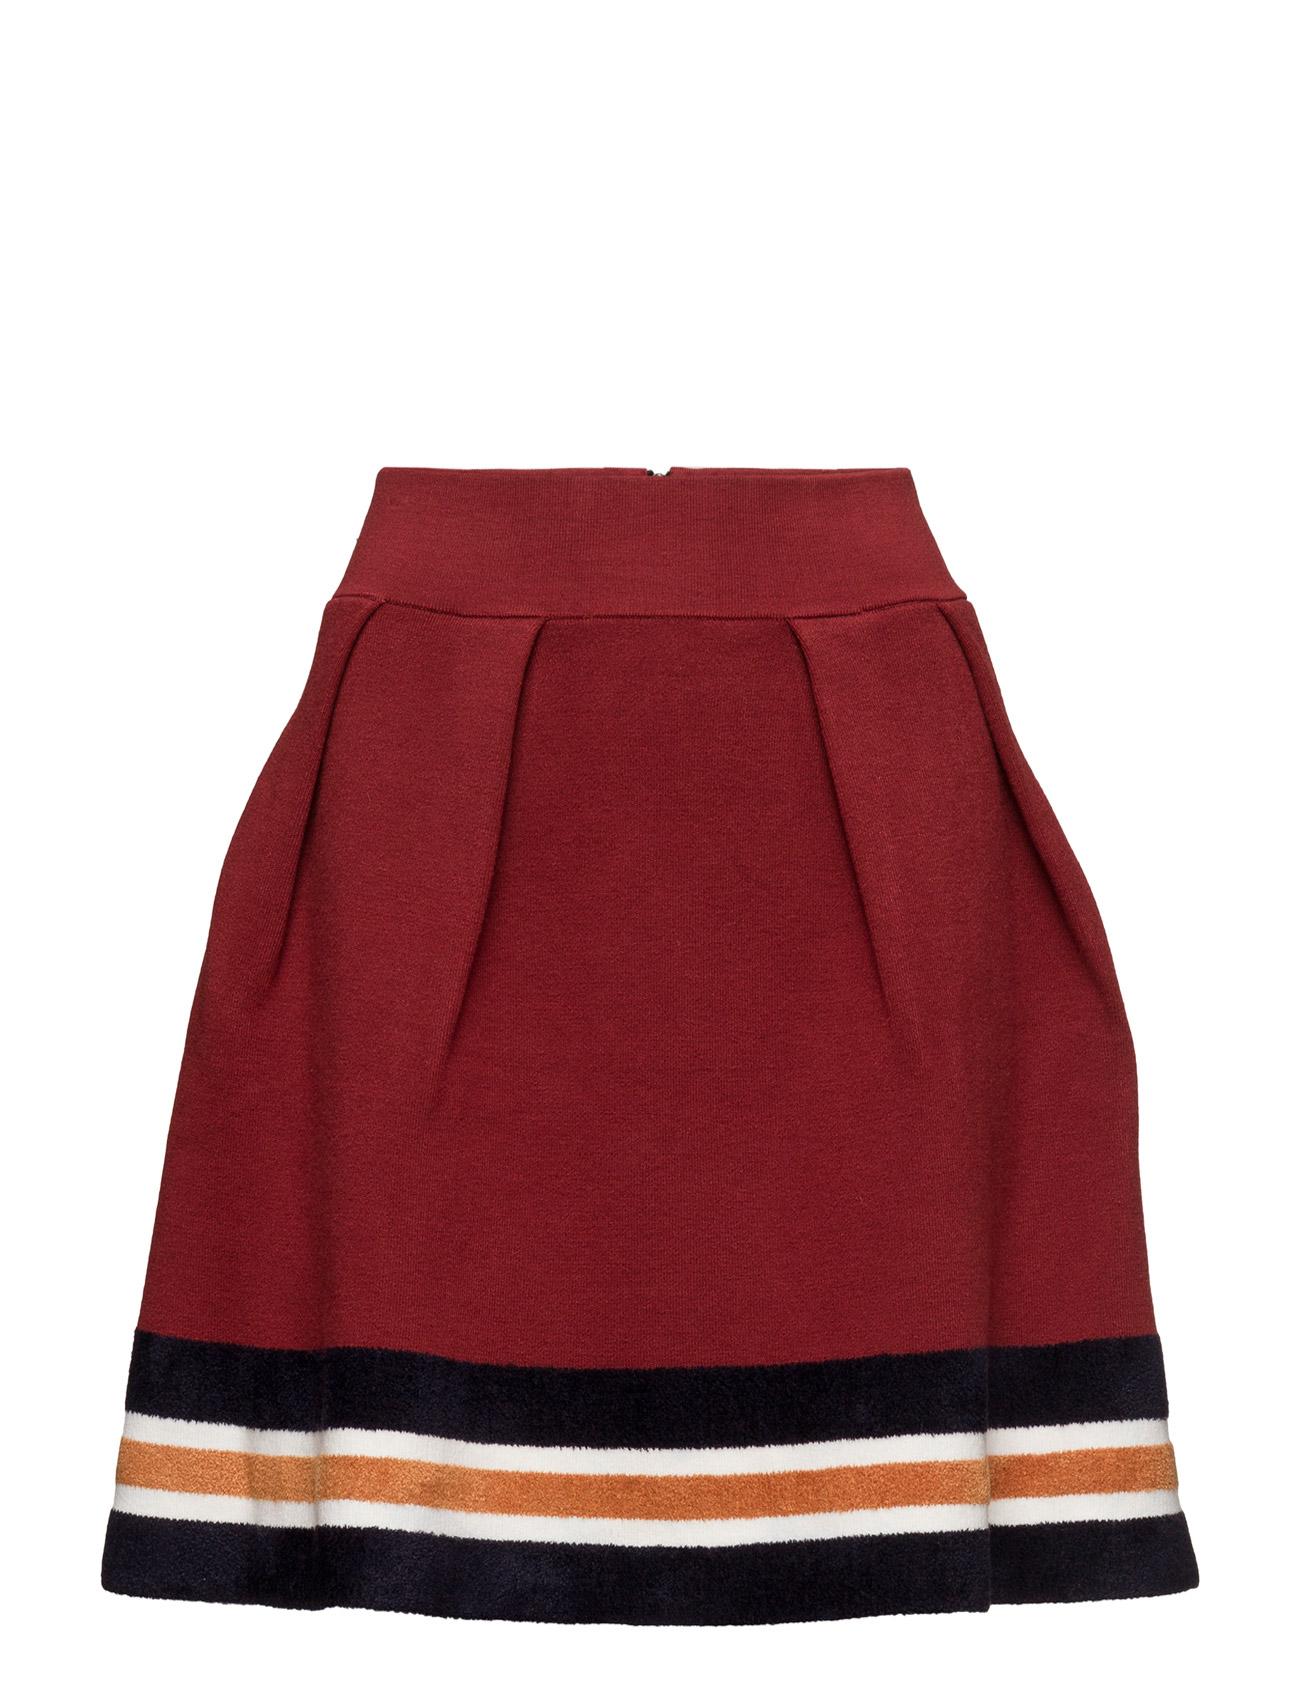 Knitted Skirt With Sporty Stripes At Hem Maison Scotch Korte til Kvinder i